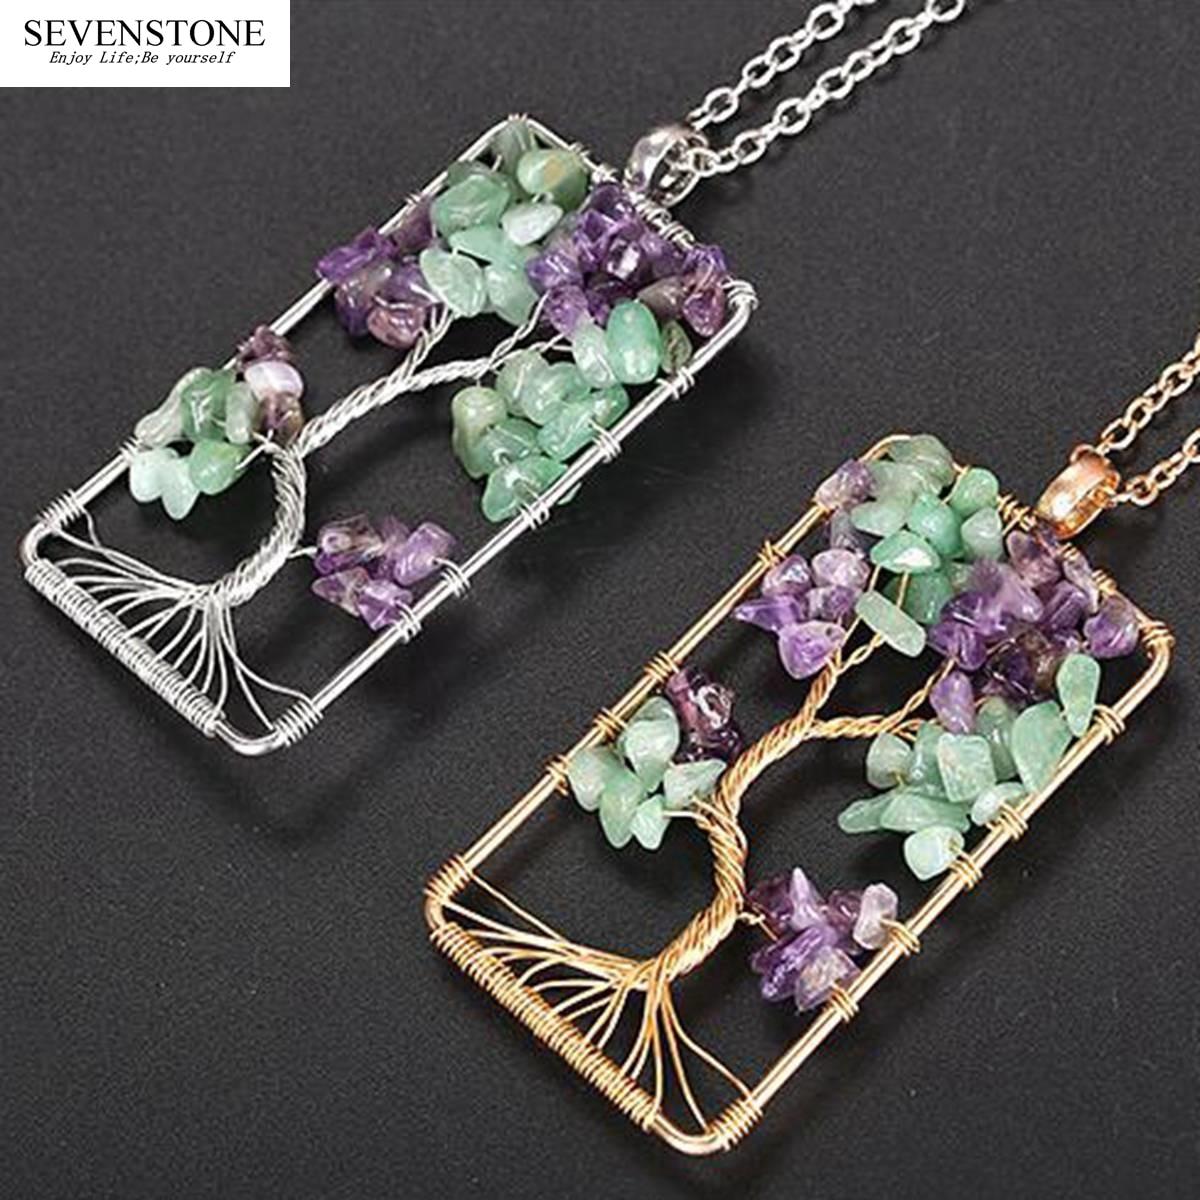 SEVENSTONE 2019 New Natural Stone Amethysts Gravel Square Tree of Life Pendant Necklaces Women Men Crystal Choker Jewelry Boho